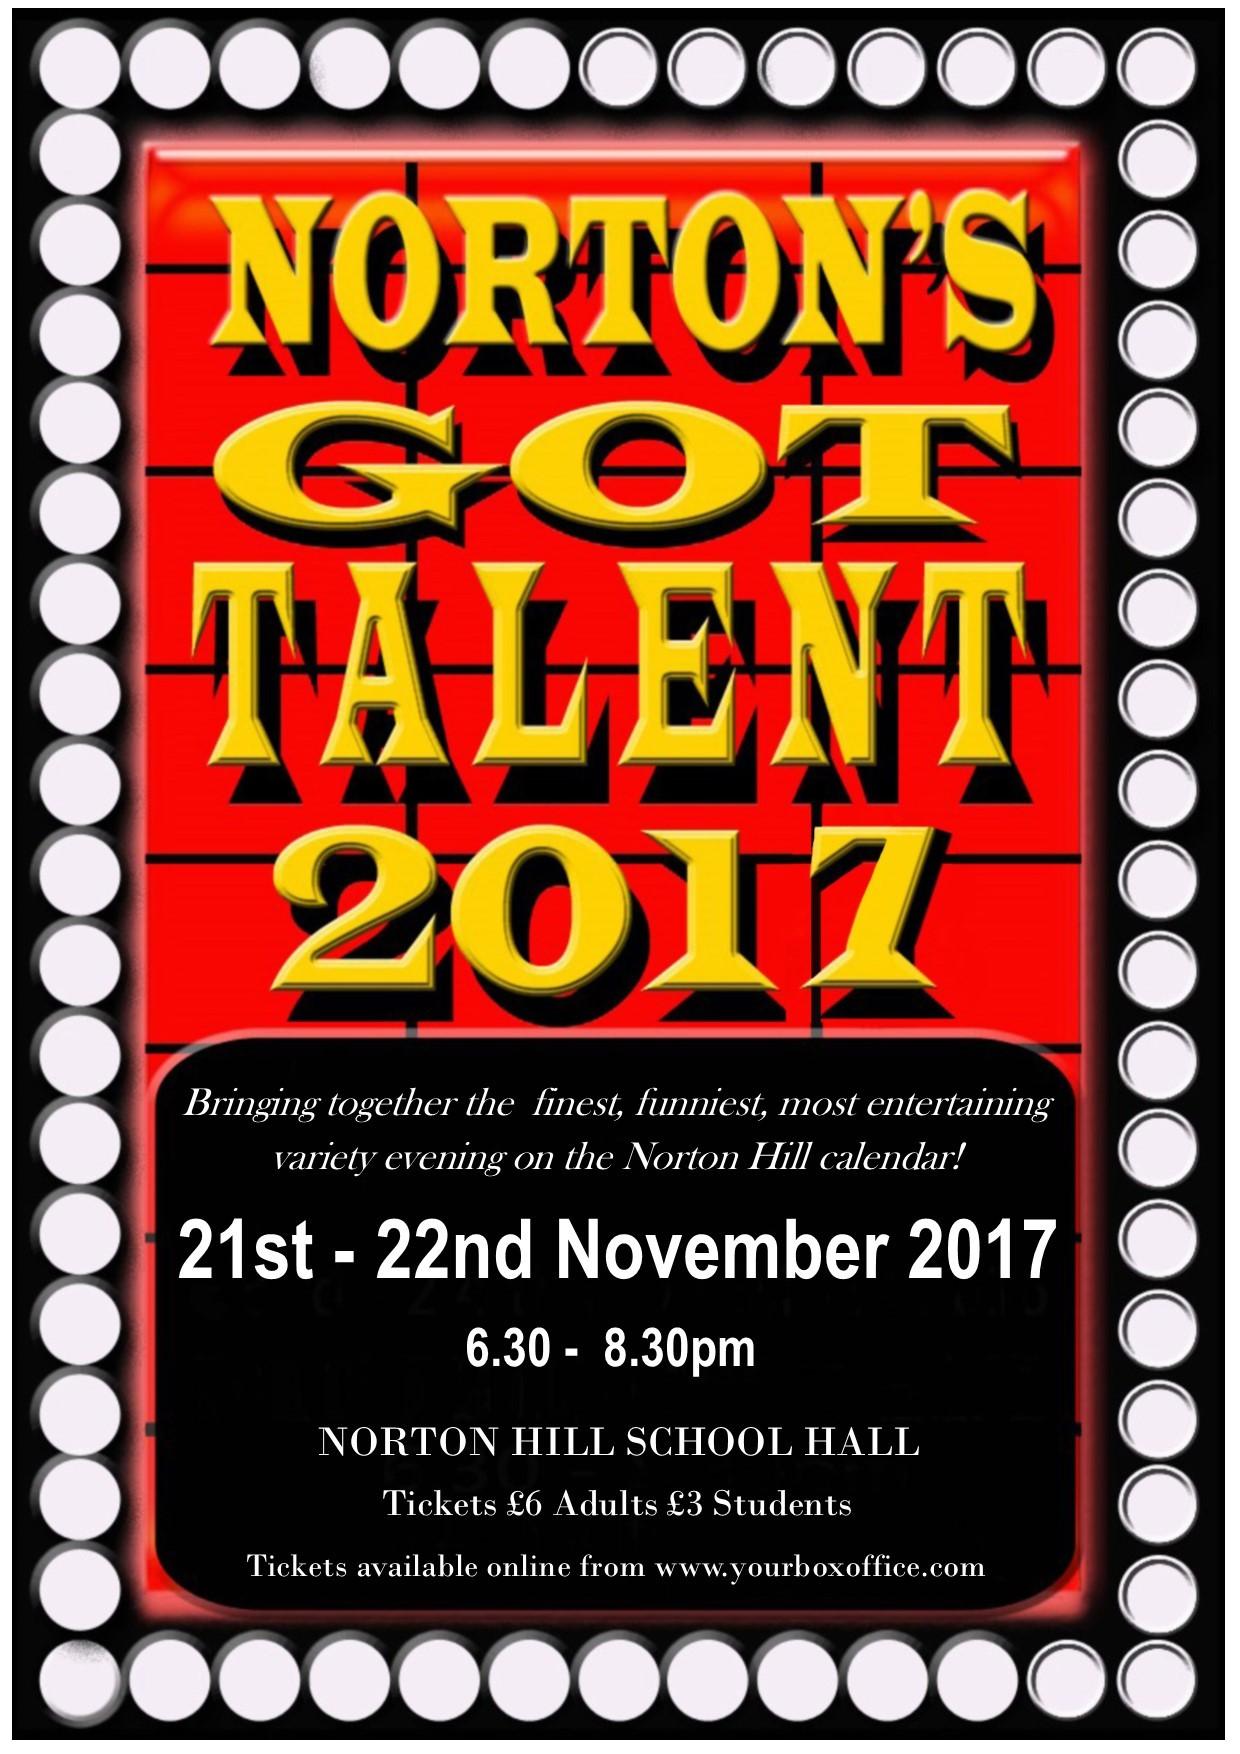 Norton's Got Talent 2017